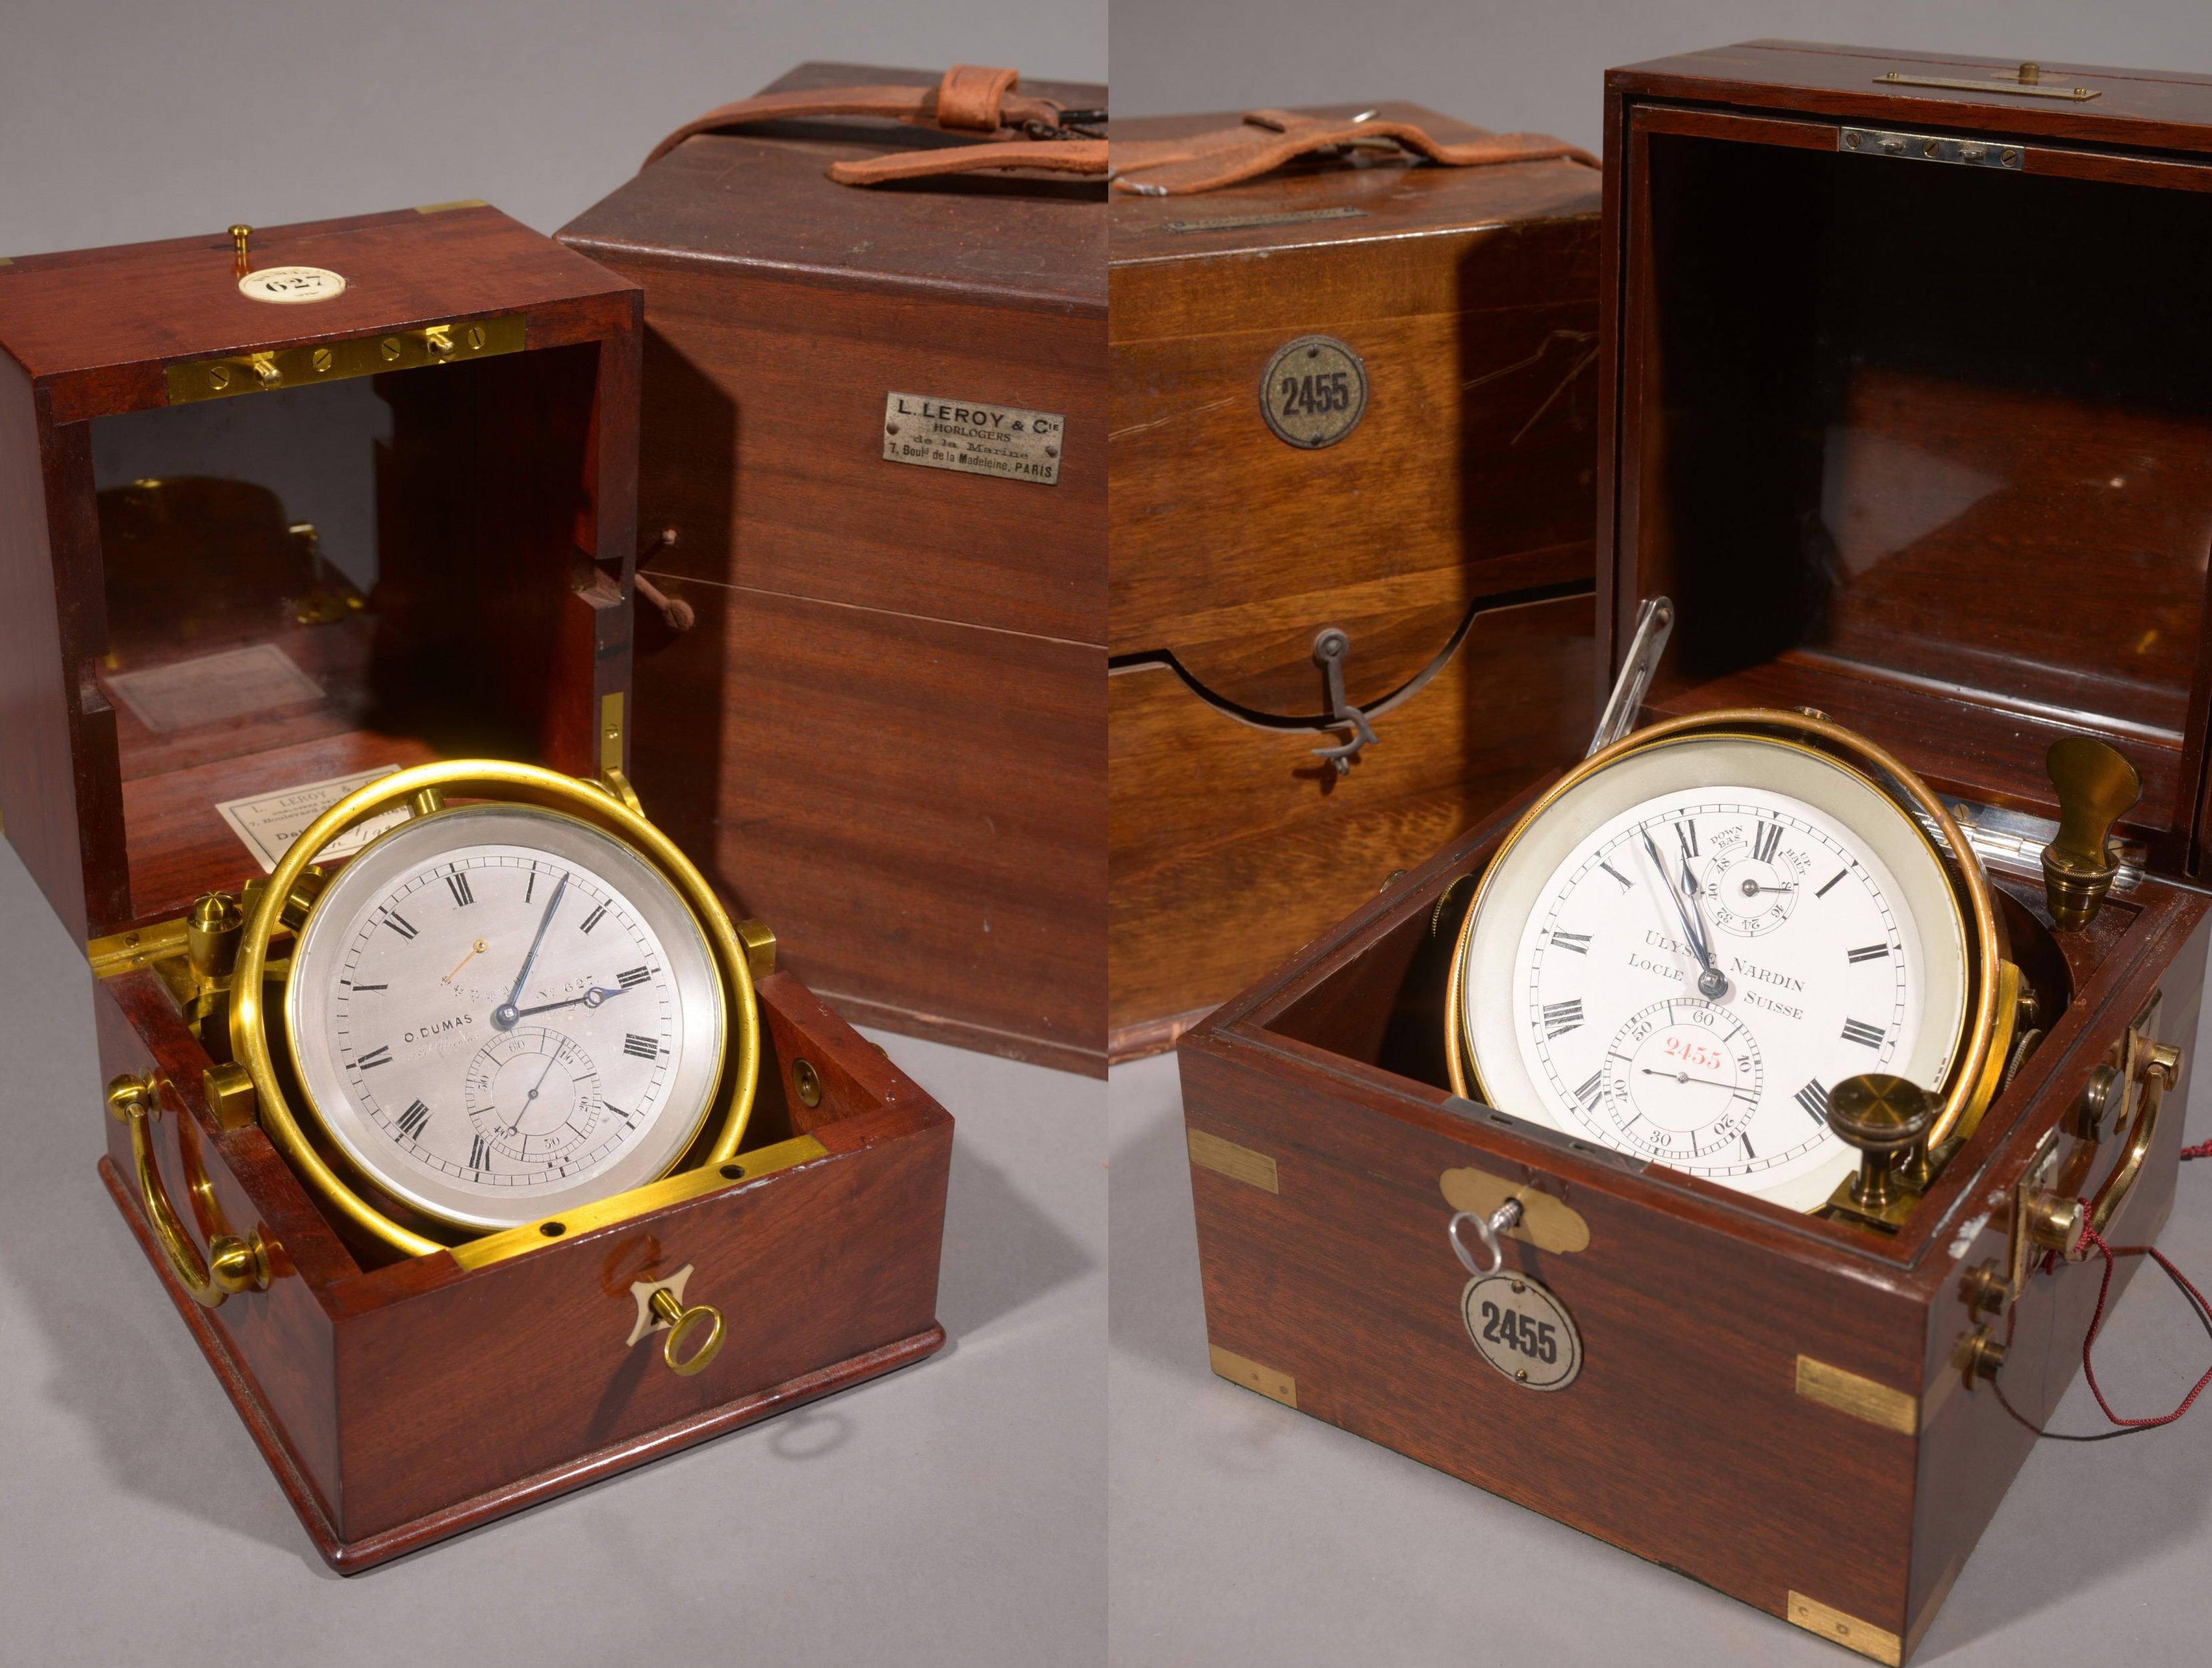 Chronomètres de marine, gauche : O. DUMAS, droite : Ulysse Nardin, images ©HVMC